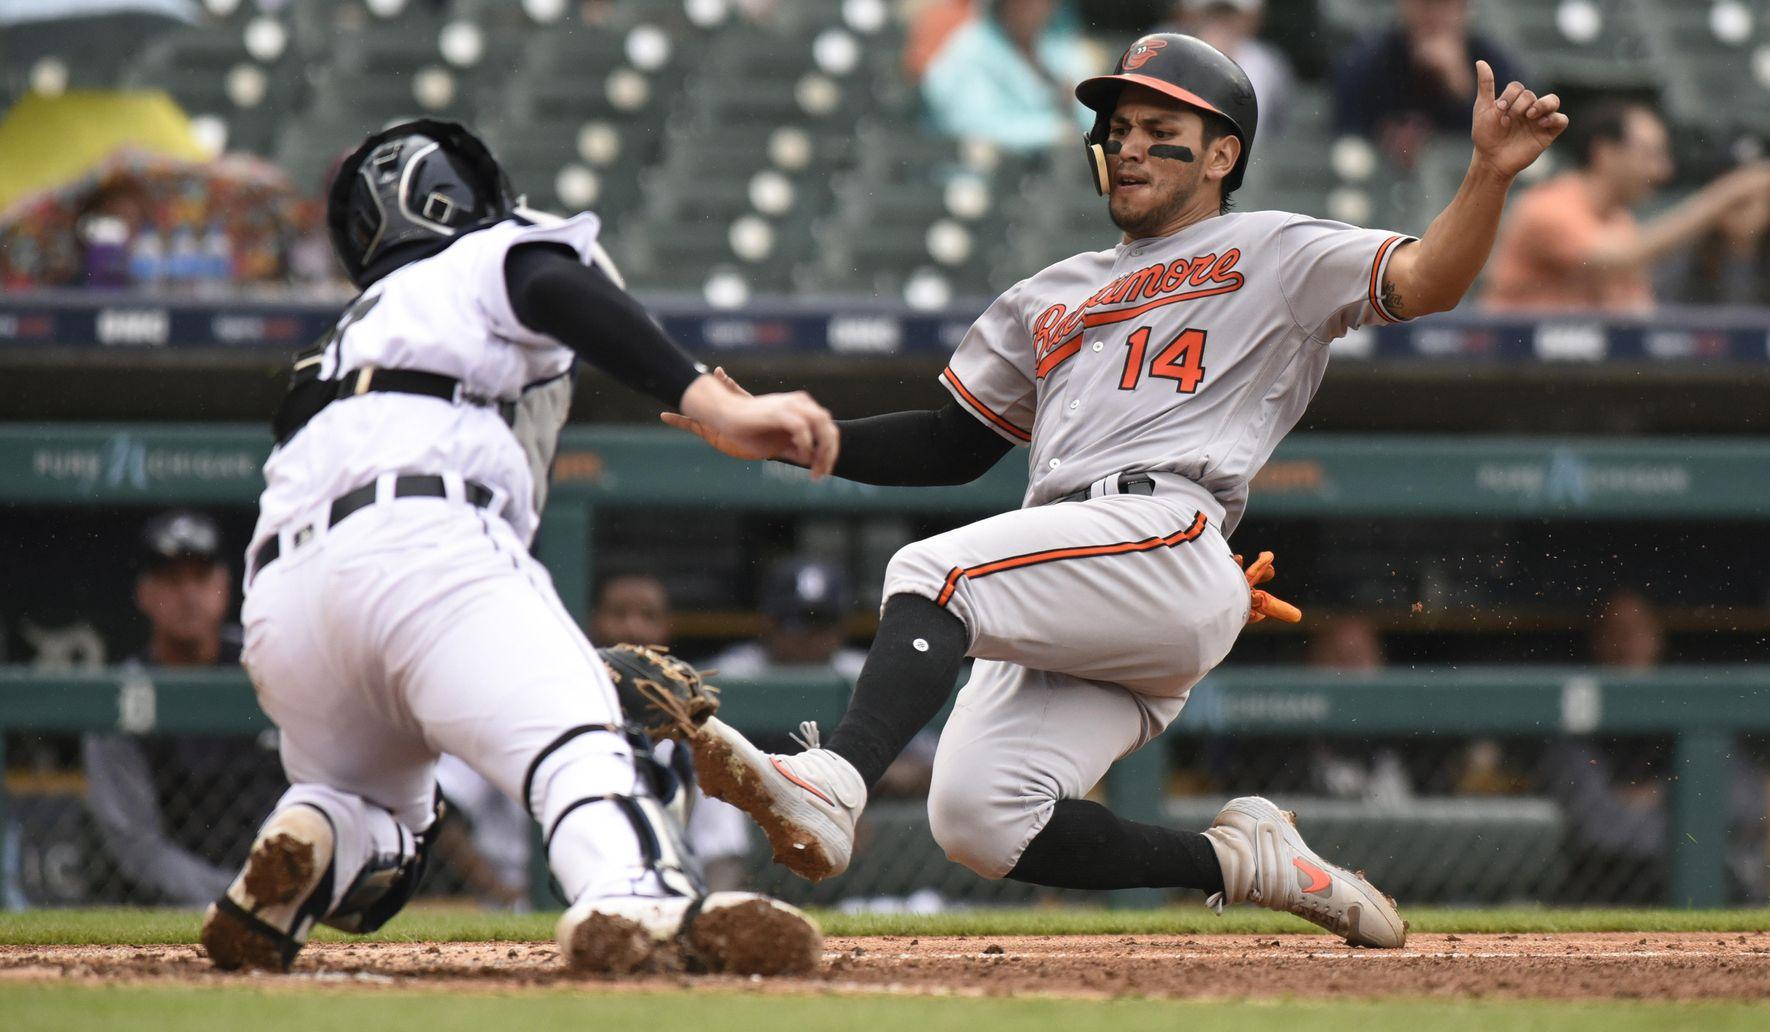 Orioles_tigers_baseball_33881_c0-246-5831-3645_s1770x1032